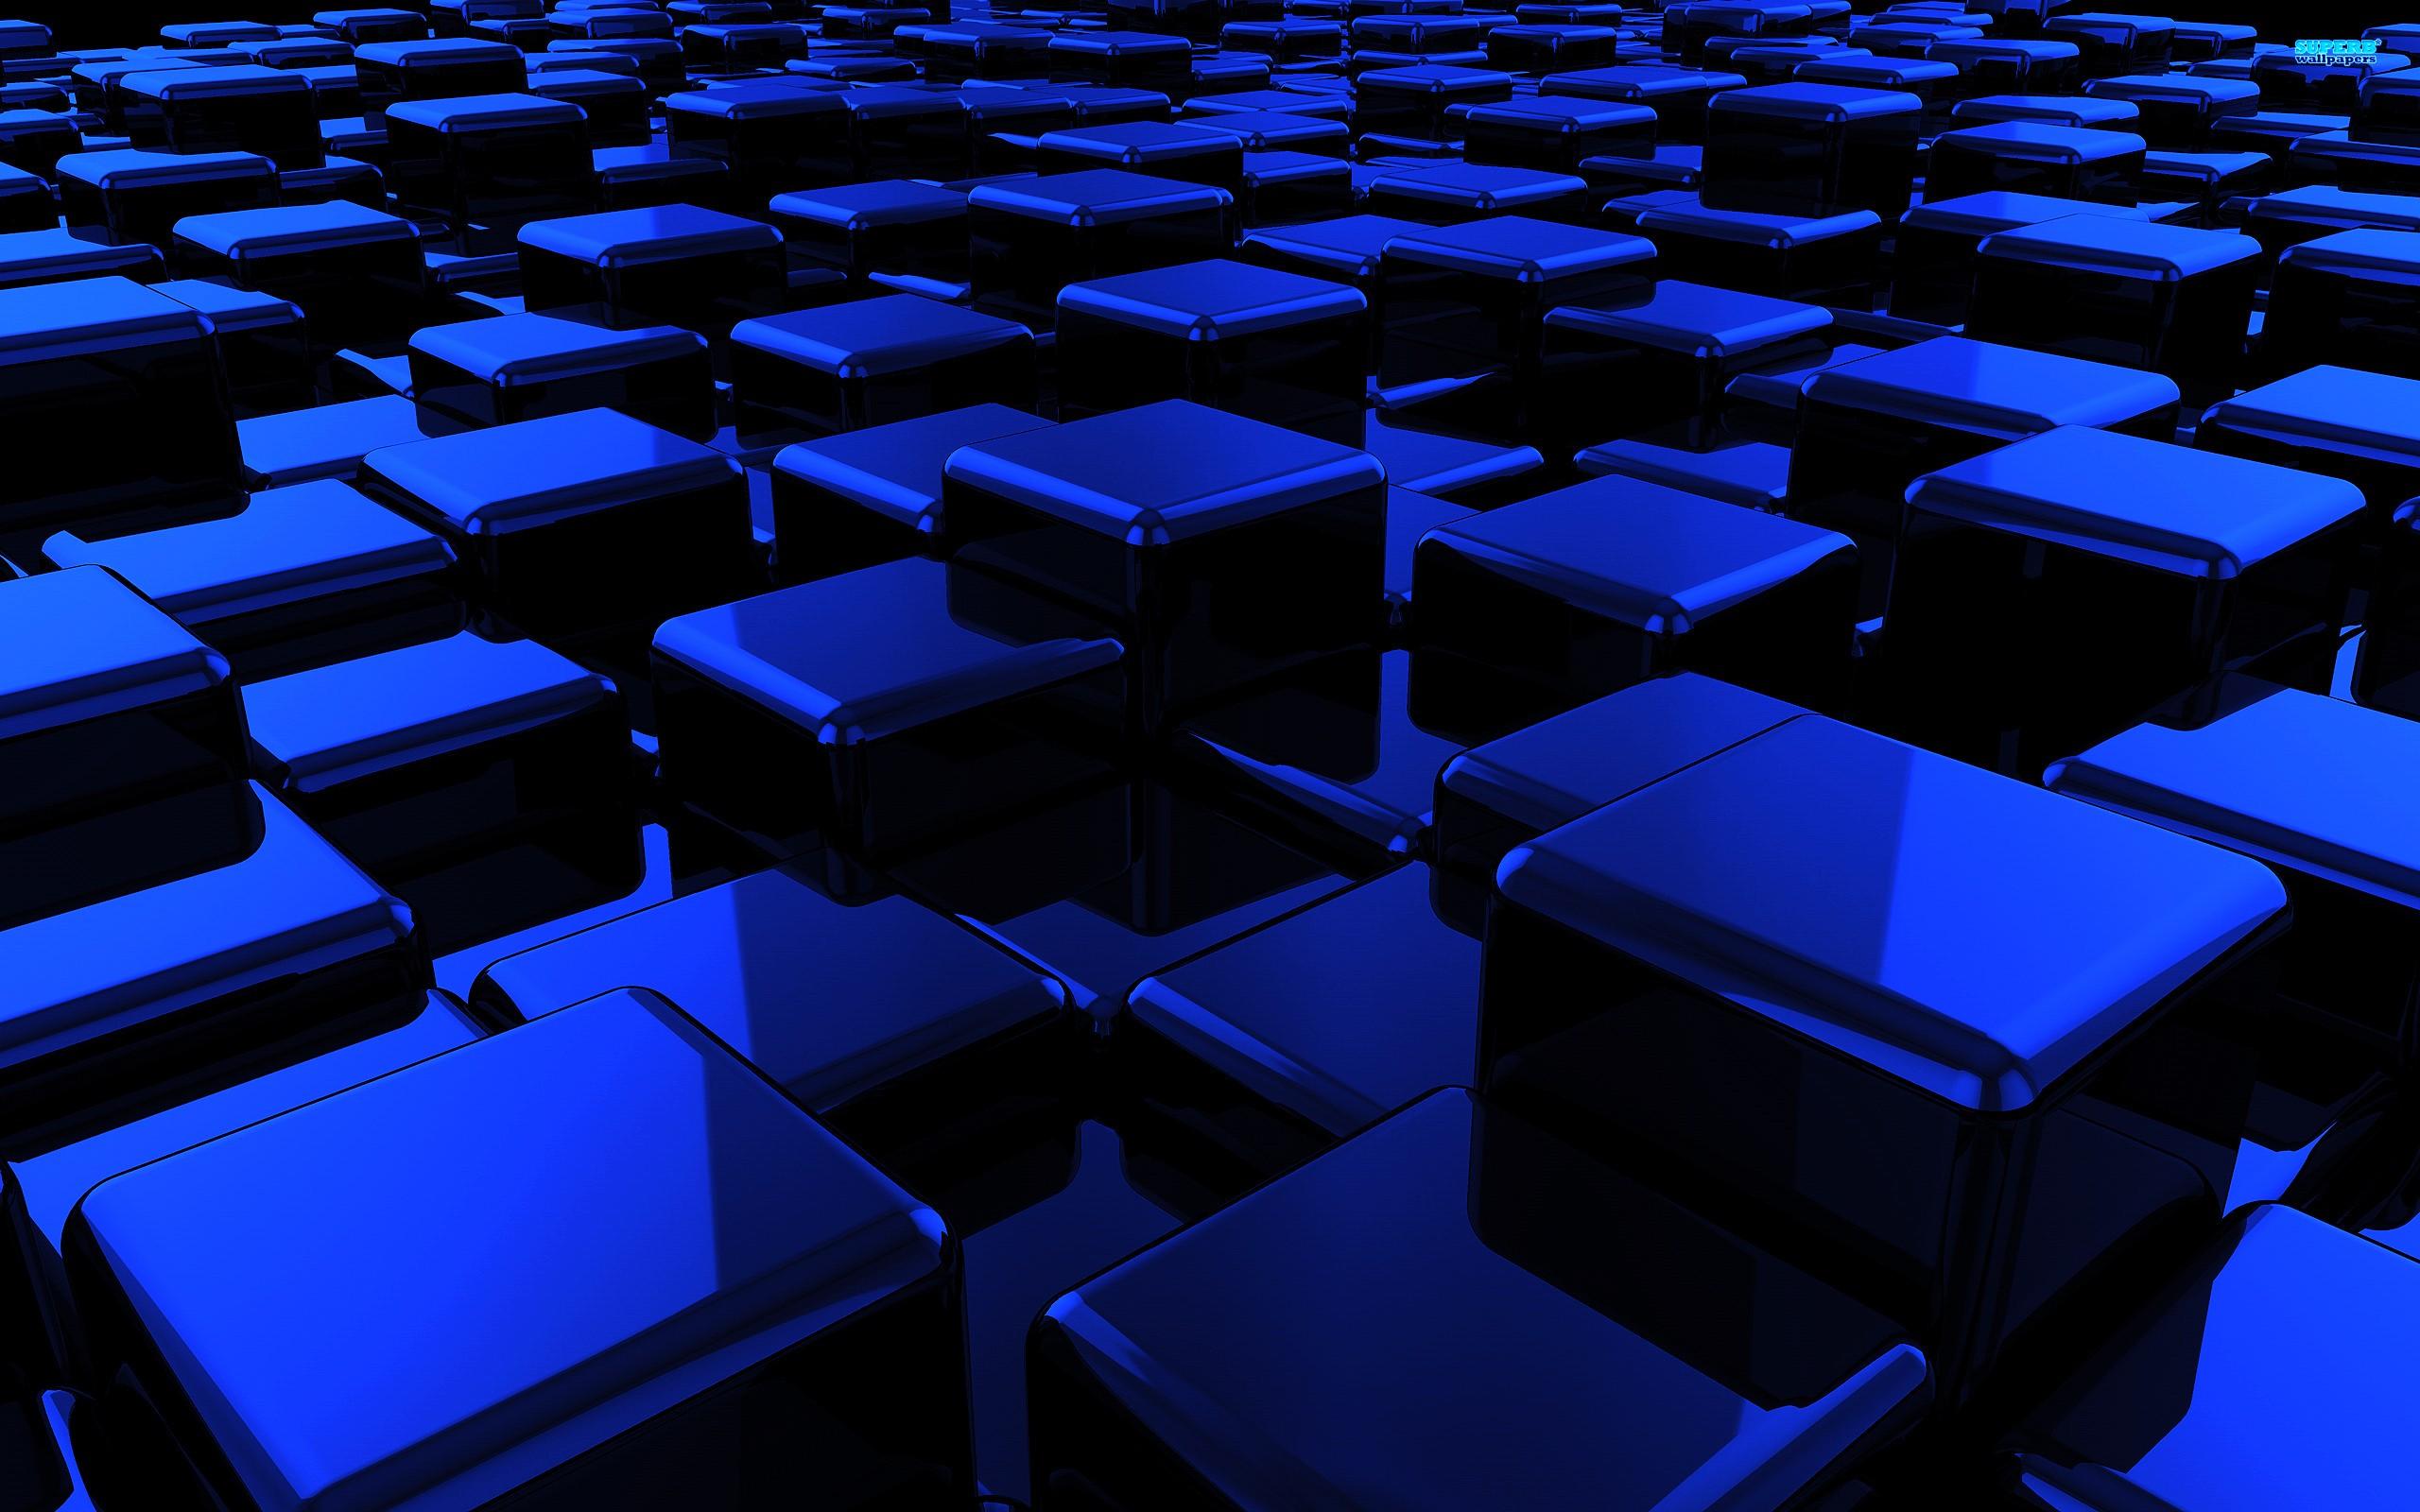 Blue Cubes Wallpaper 2560x1600 Blue Cubes 2560x1600